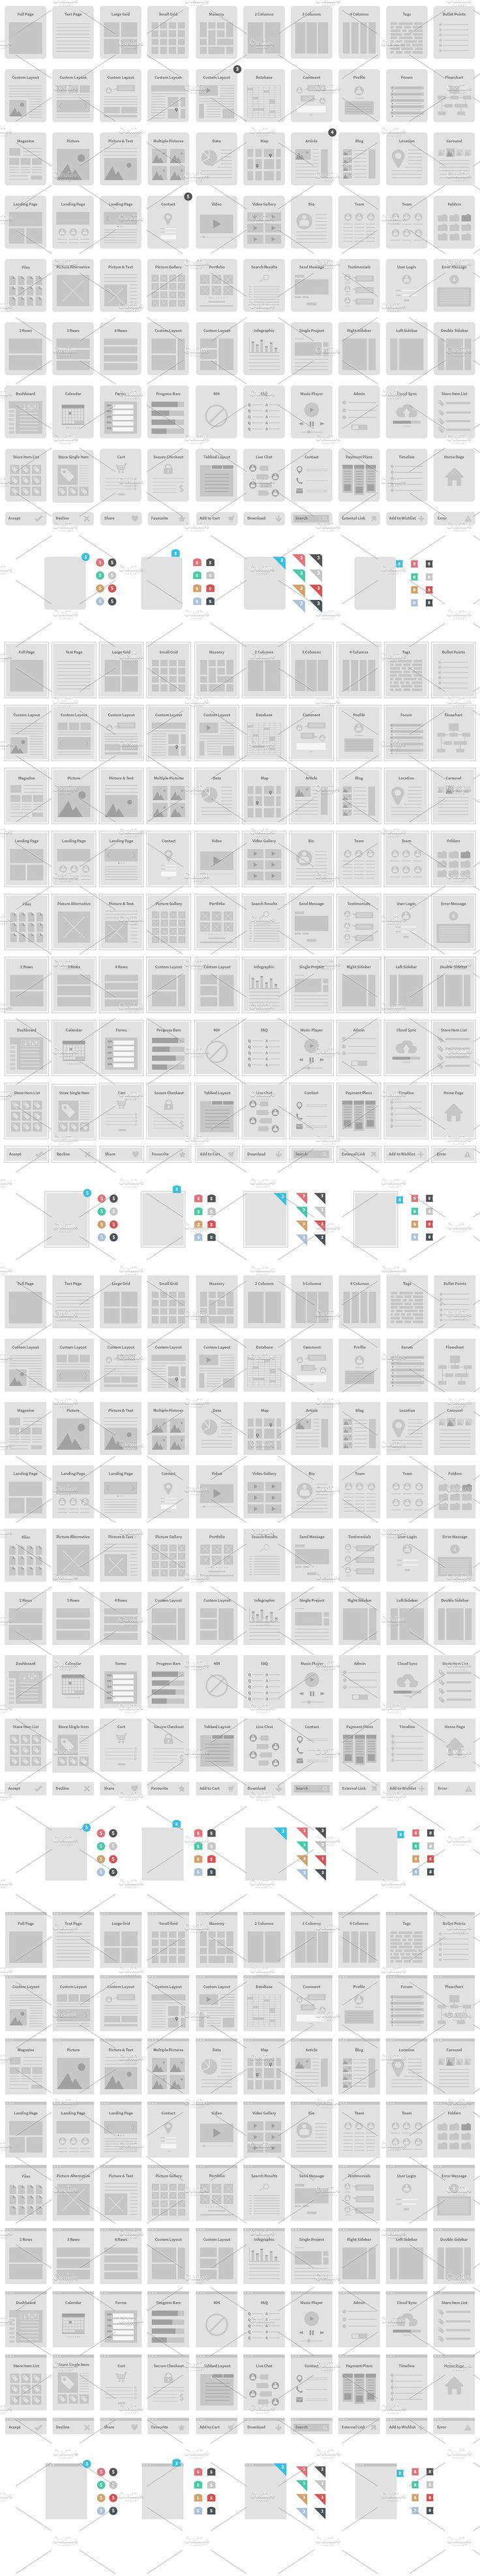 Website Wireframe Kit by Tugcu Design Co. on @creativemarket